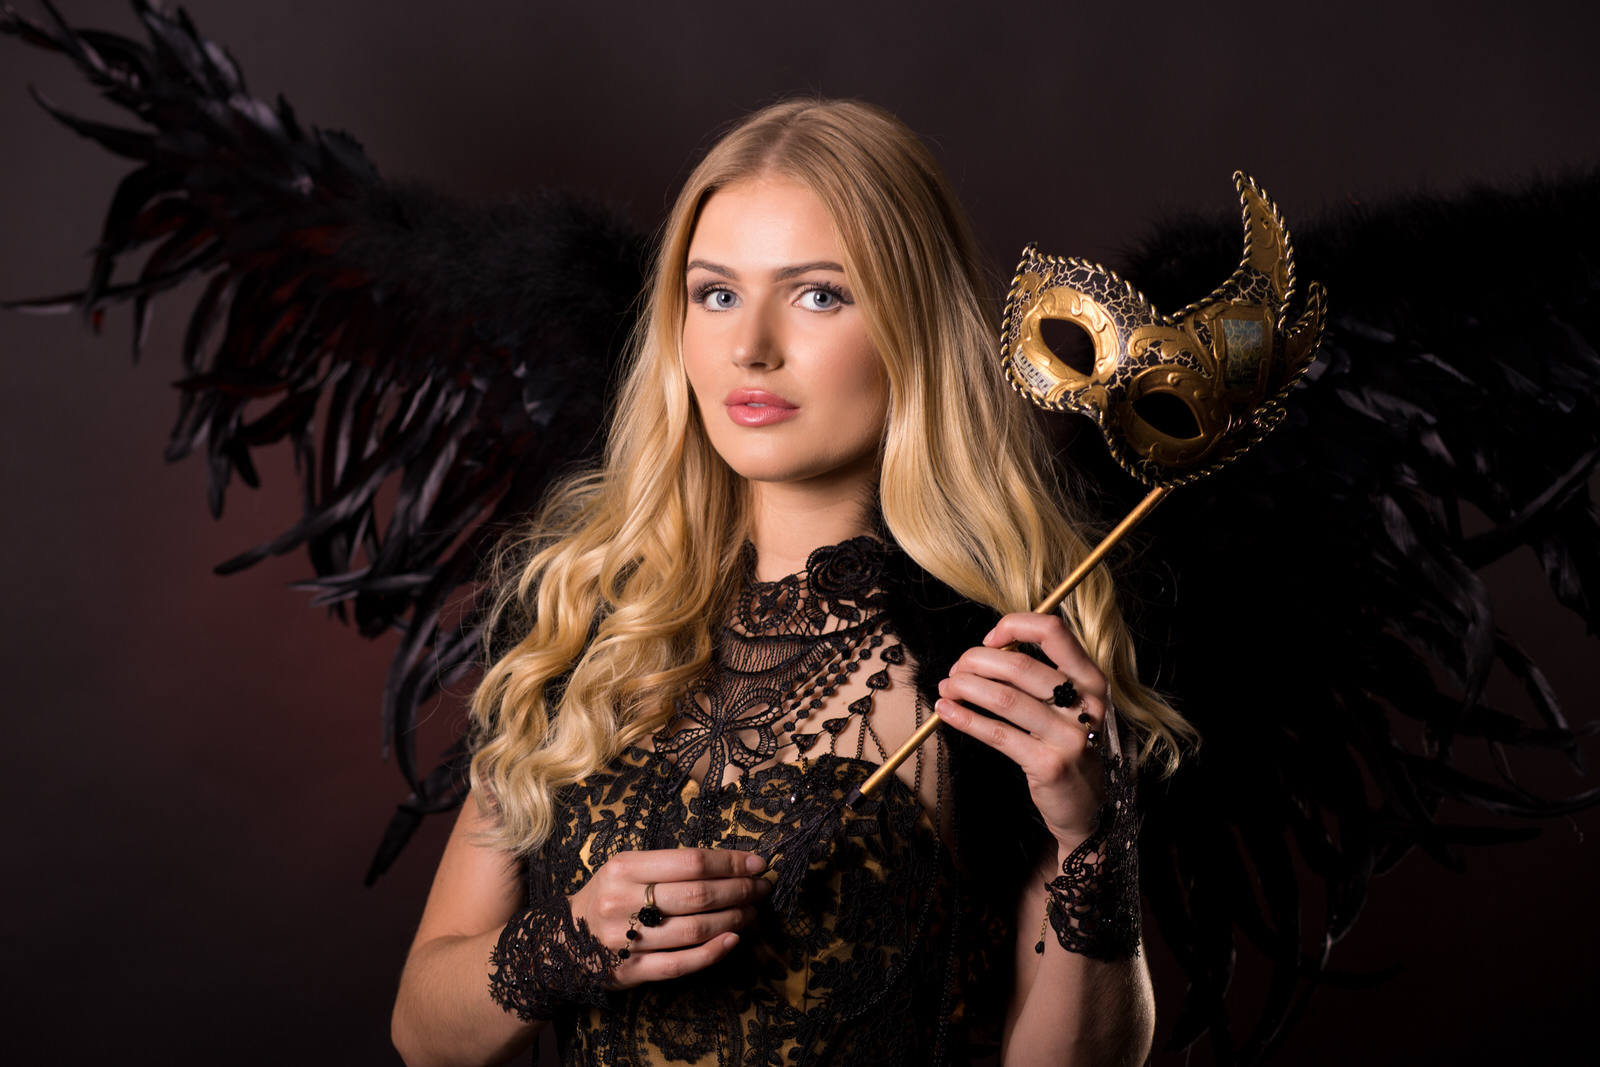 Venetiaanse Dames, Gemaskerd Gala, Exclusive Ball, Ball Masque, Masquerade, Avondkleding, Black Wings, Gala Angel, Secret Beauty, Thema Dames, Hostess, Mysterious Black.